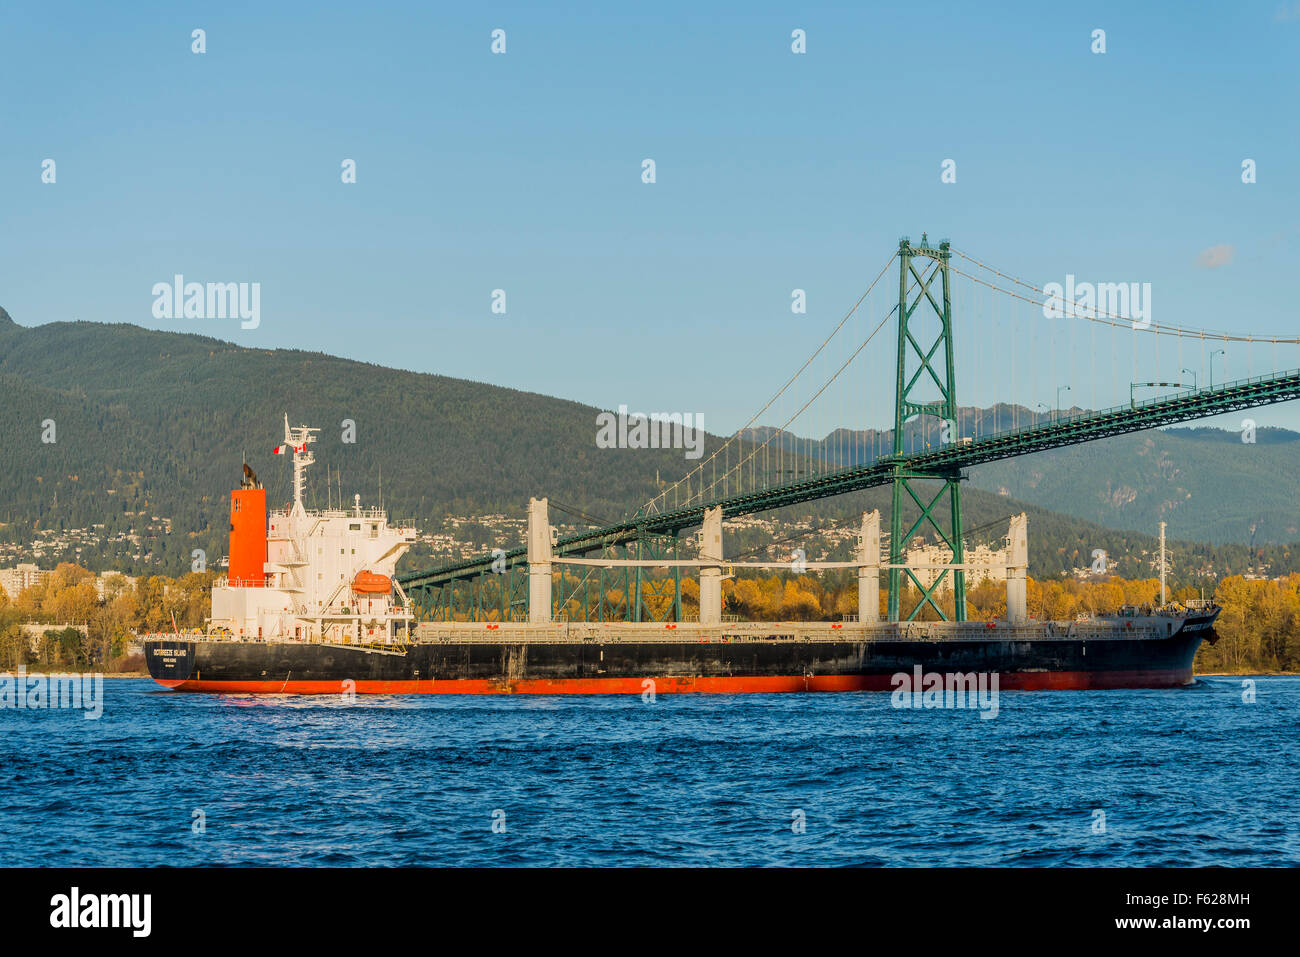 General Cargo ship, Octbreeze Island, passes under Lions Gate Bridge,   Vancouver, British Columbia, Canada - Stock Image